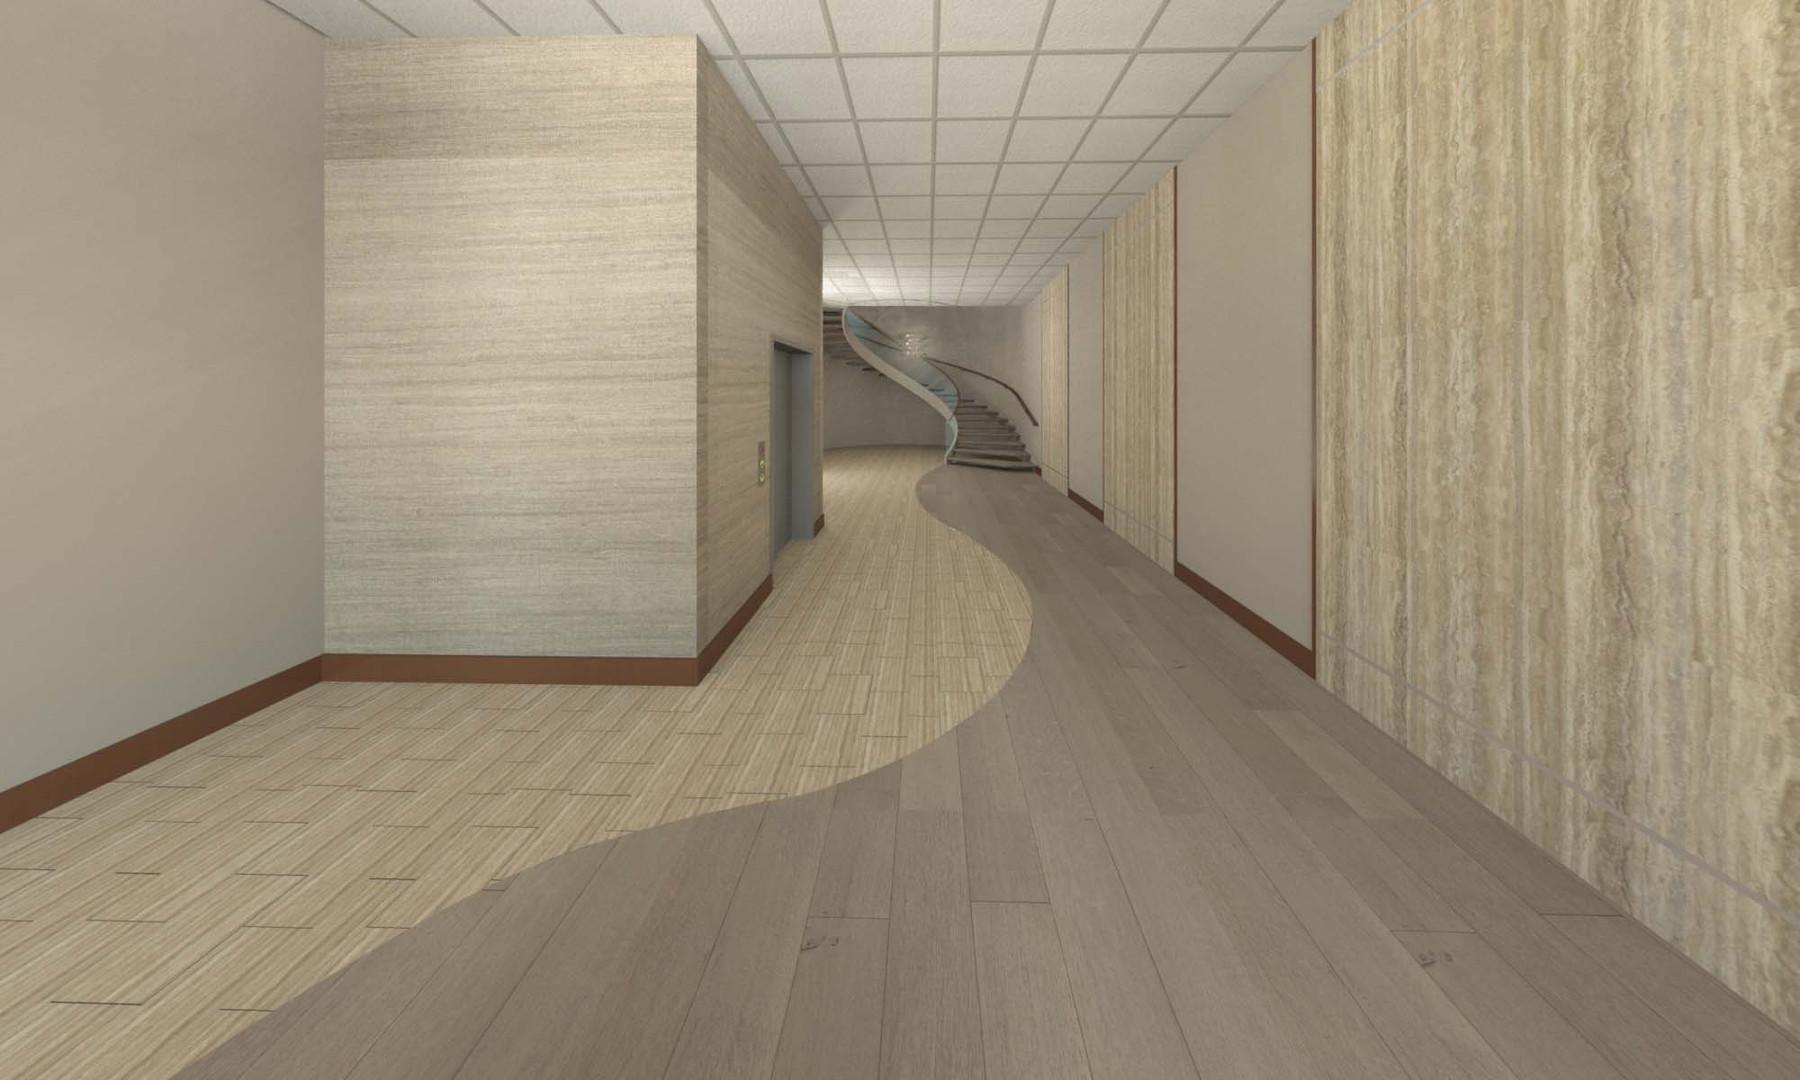 CSPS no ceiling stair copy.jpg